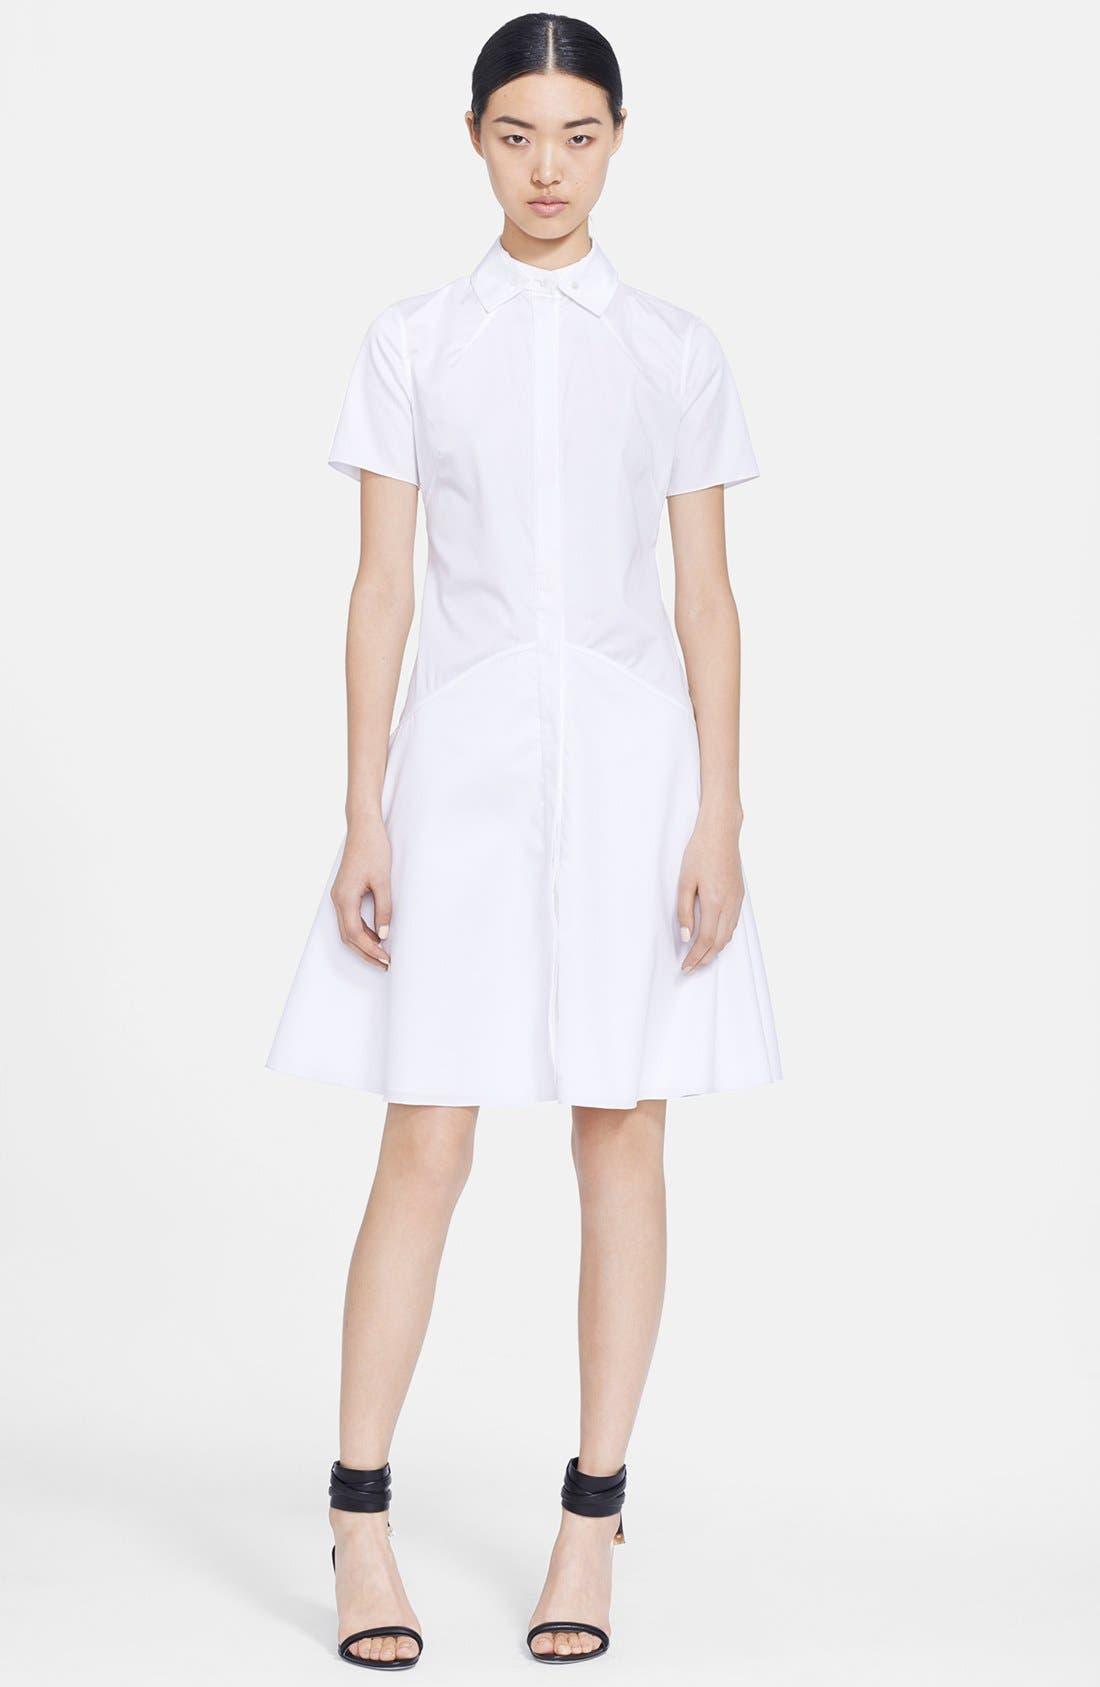 Alternate Image 1 Selected - Jason Wu Poplin Fit & Flare Shirtdress